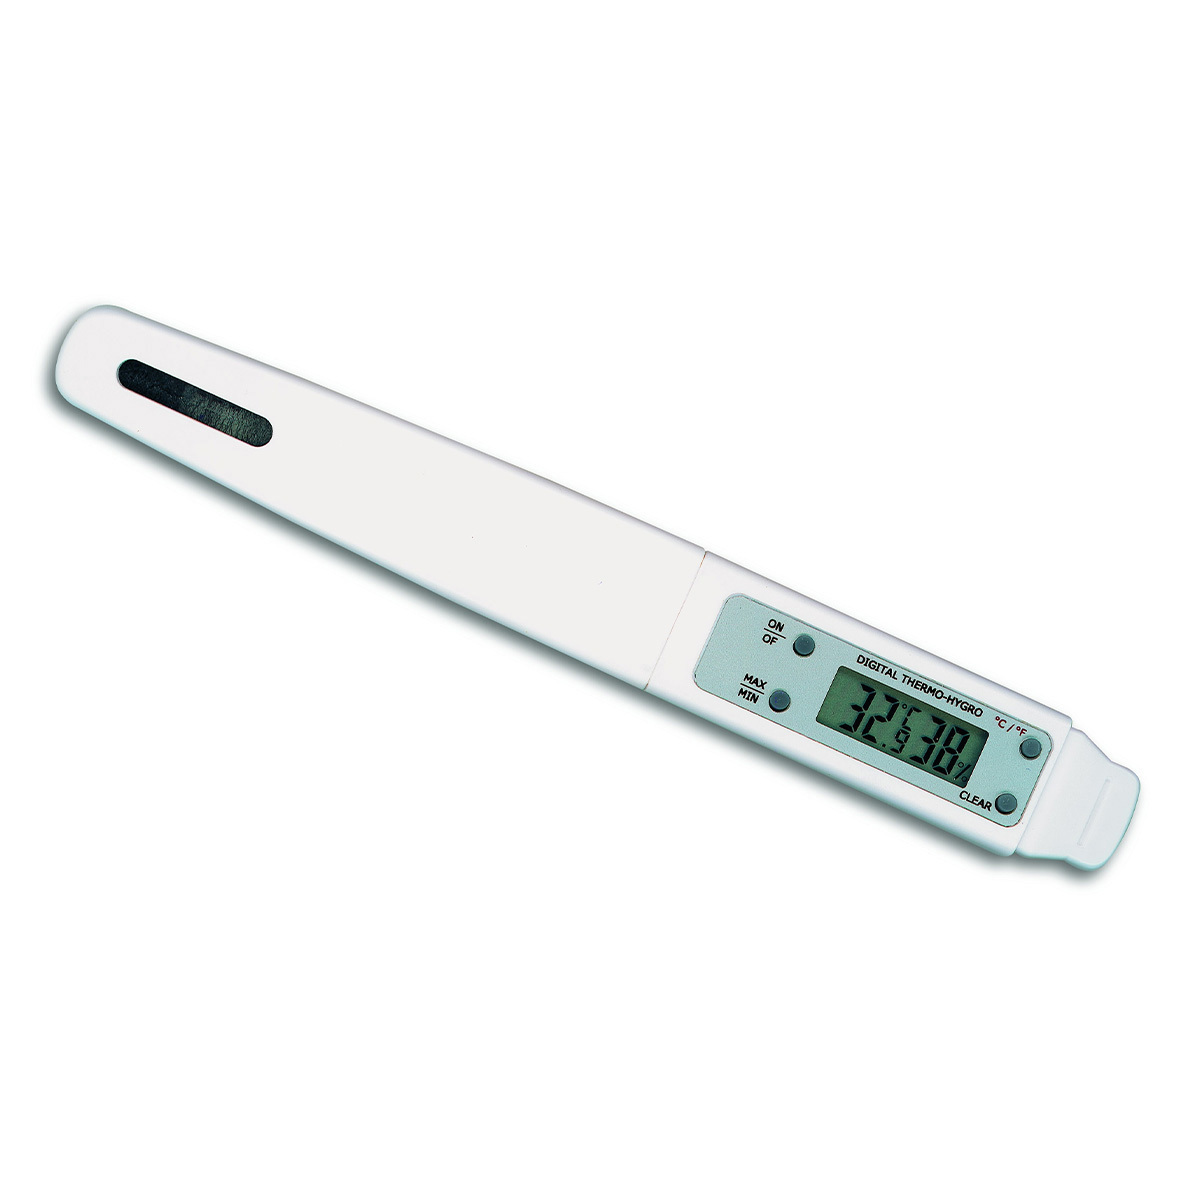 30-5007-digitales-pocket-thermo-hygrometer-1200x1200px.jpg